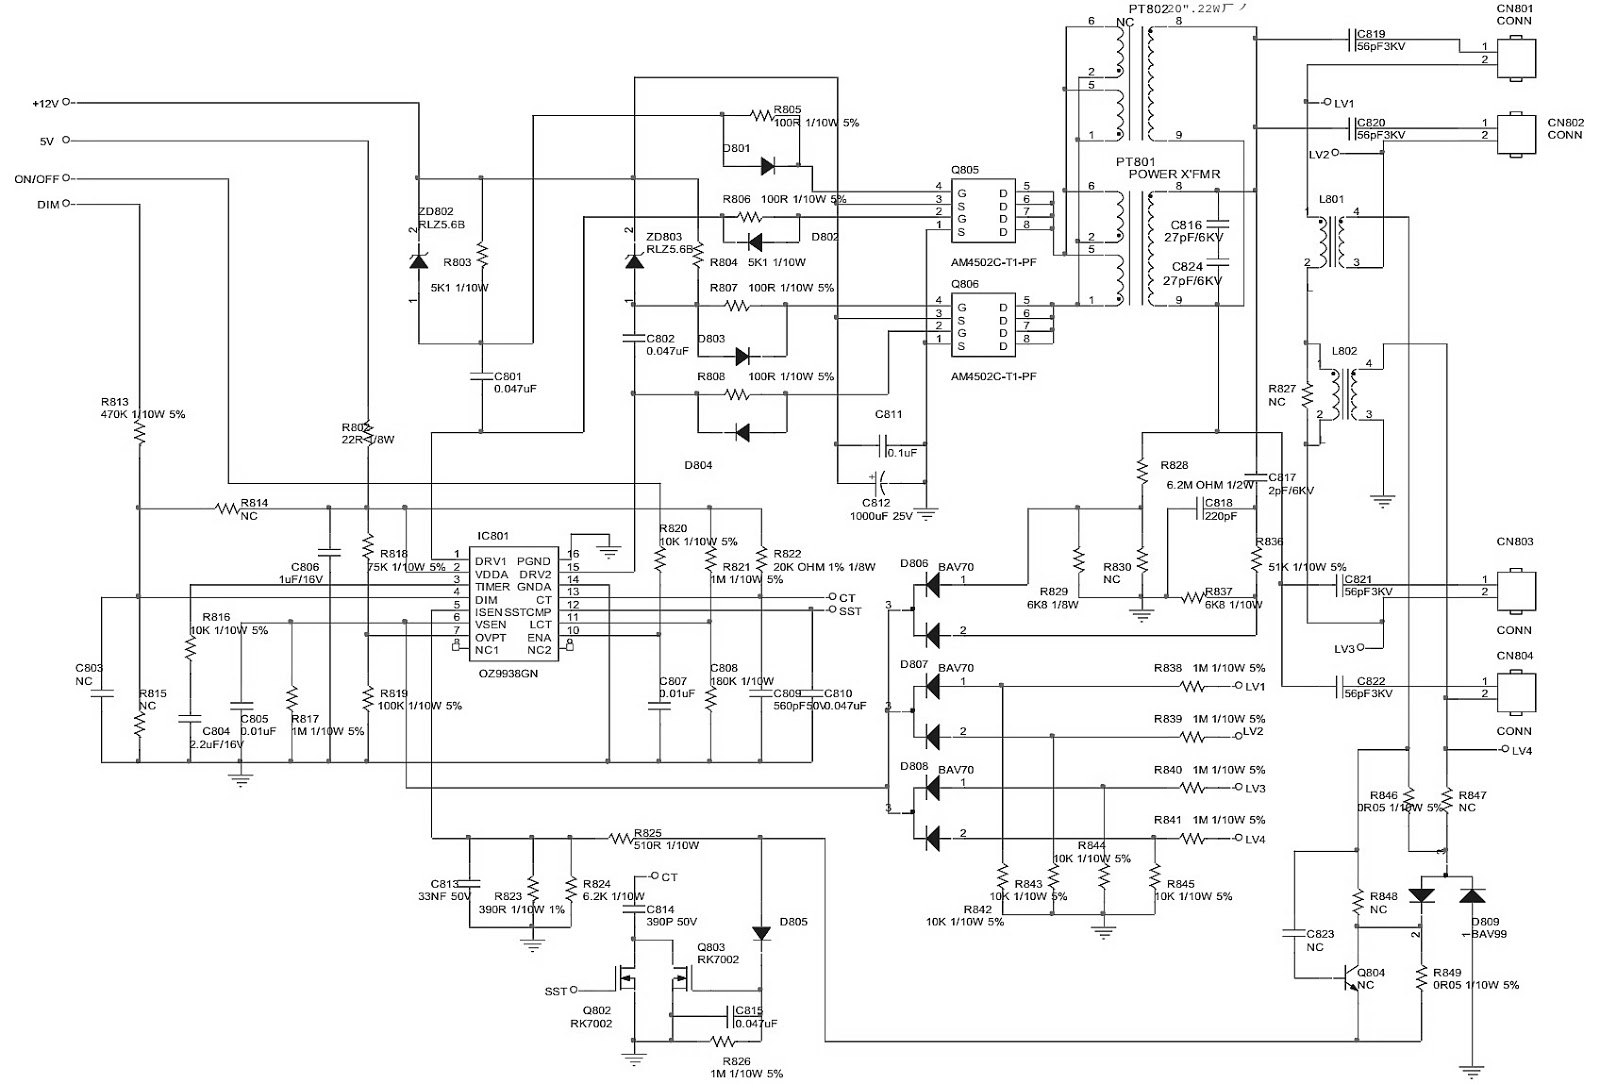 Incredible Circuitdiagram Controlcircuit Skyworthtvpowerboardcircuithtml Wiring Digital Resources Caliashwinbiharinl